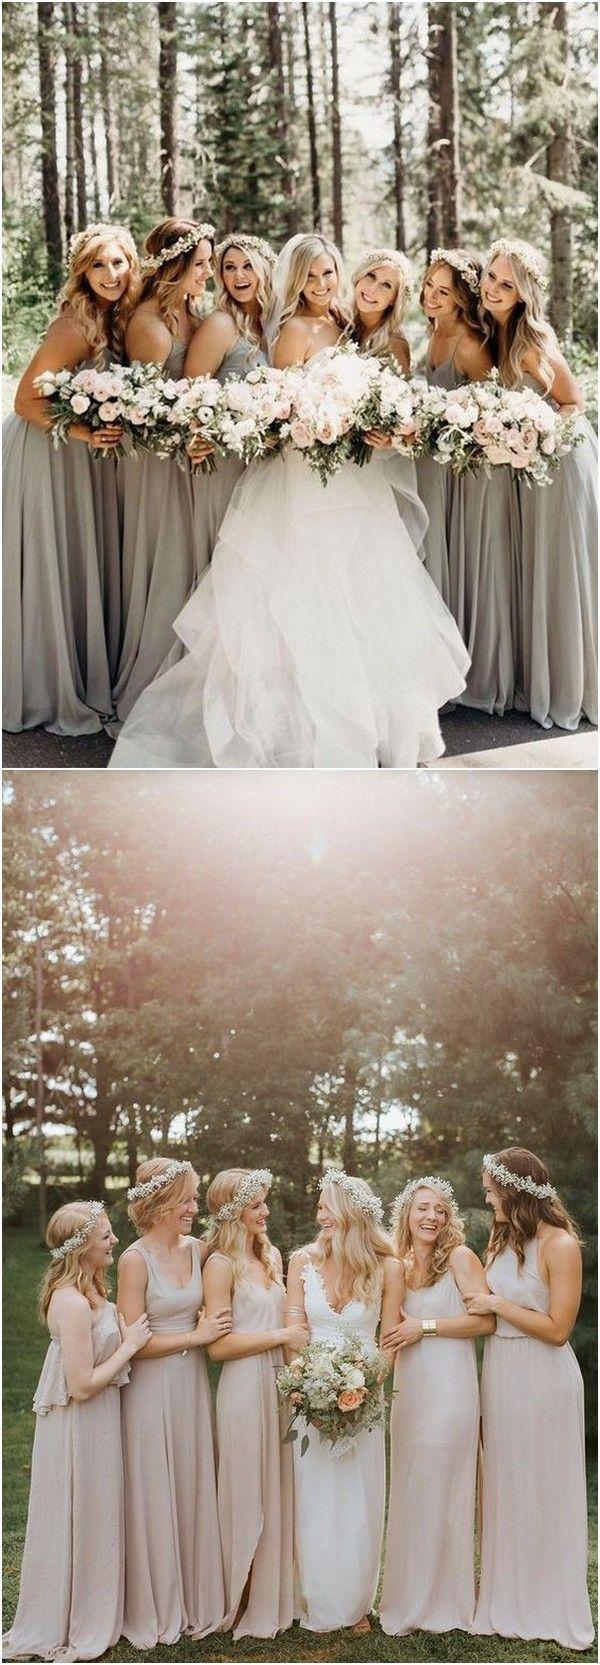 2019 Trending – 40 Elegant Neutral Color Wedding Ideas – Danielle Carter